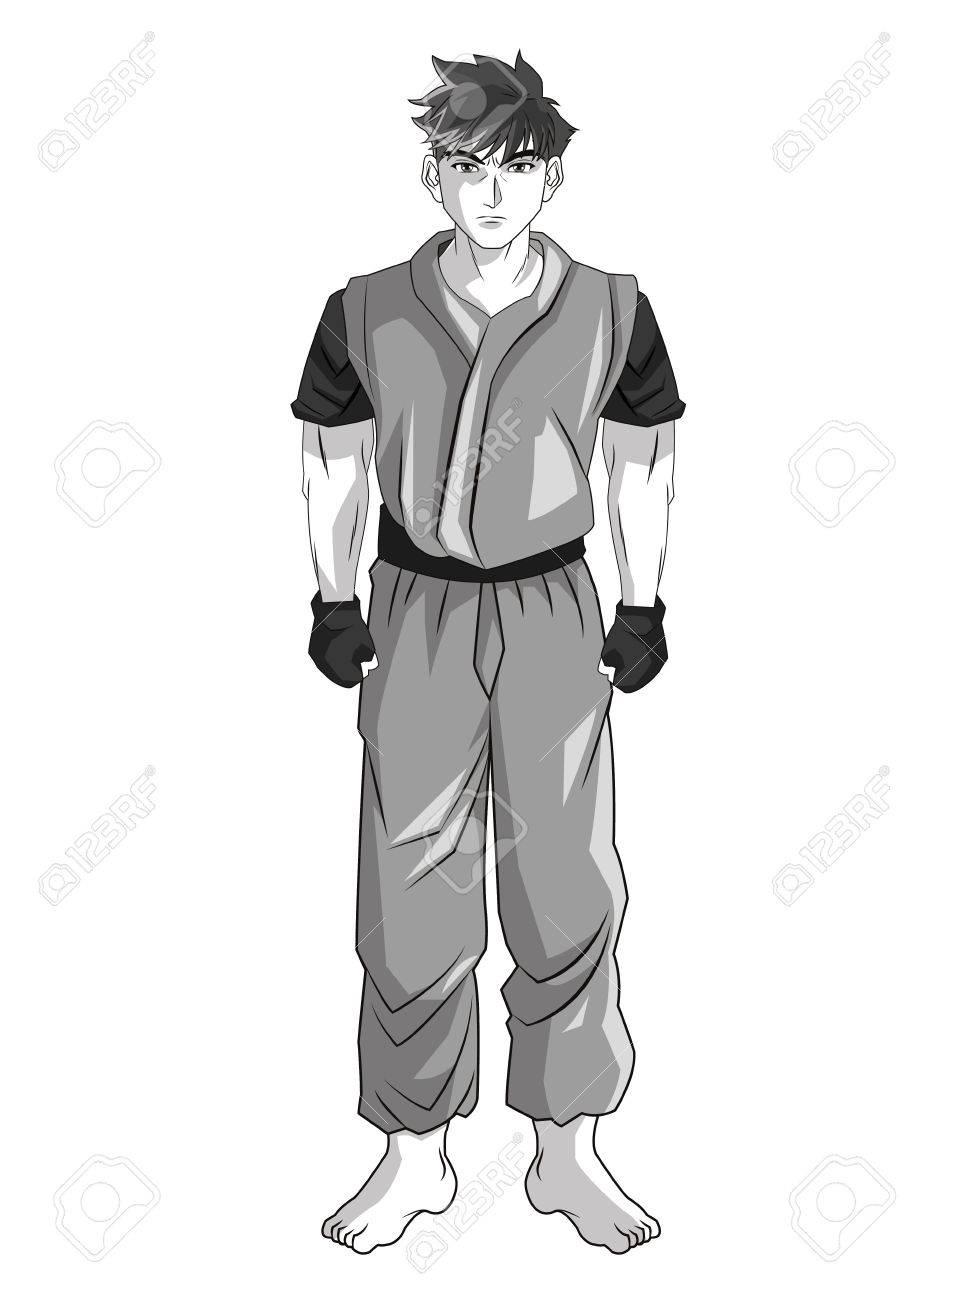 Man boy young anime manga comic cartoon fight icon black white